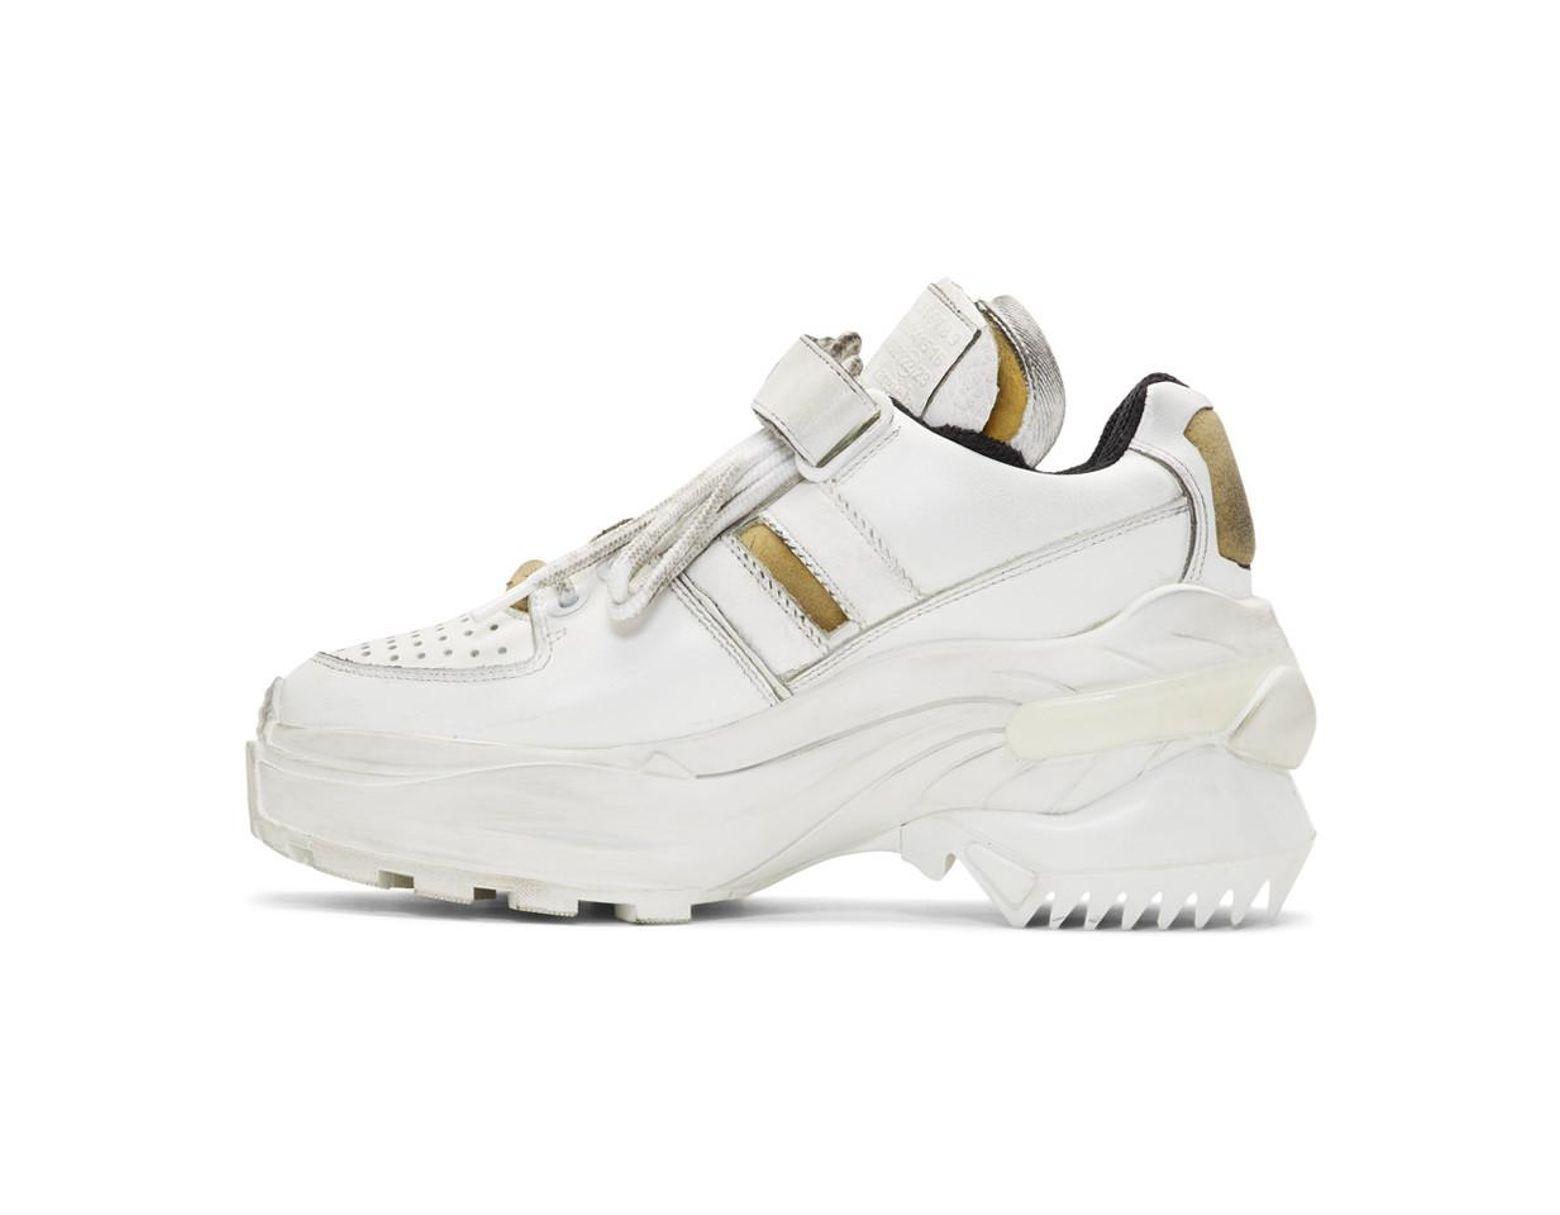 new york 14c5c 38201 Lyst - Maison Margiela White Retro Fit Sneakers